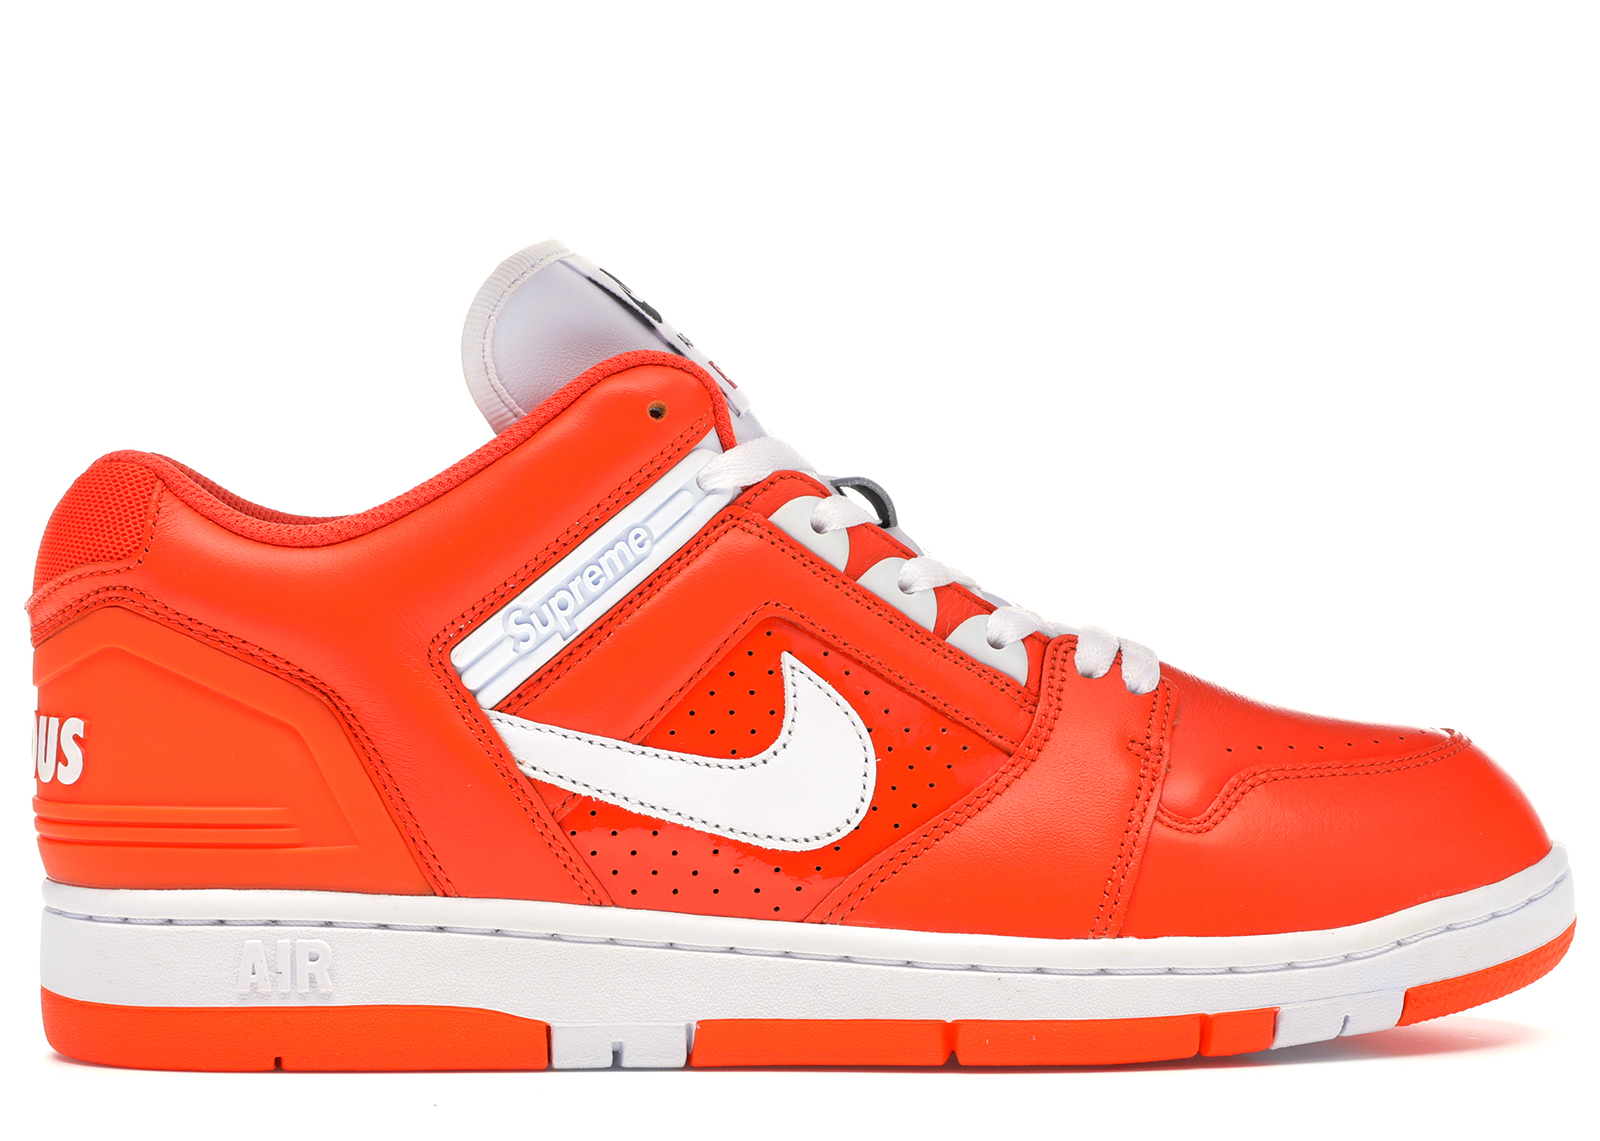 Nike SB Air Force 2 Low Supreme Orange - AA0871-818